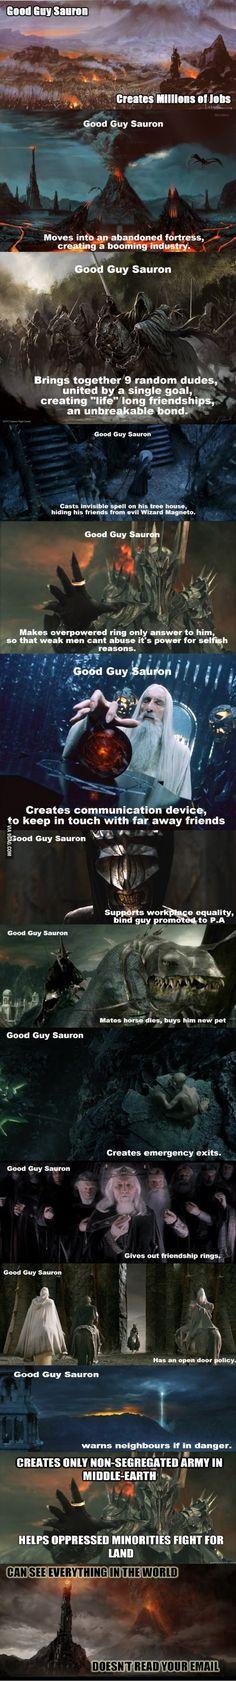 Good Guy Sauron. Long post no potato.